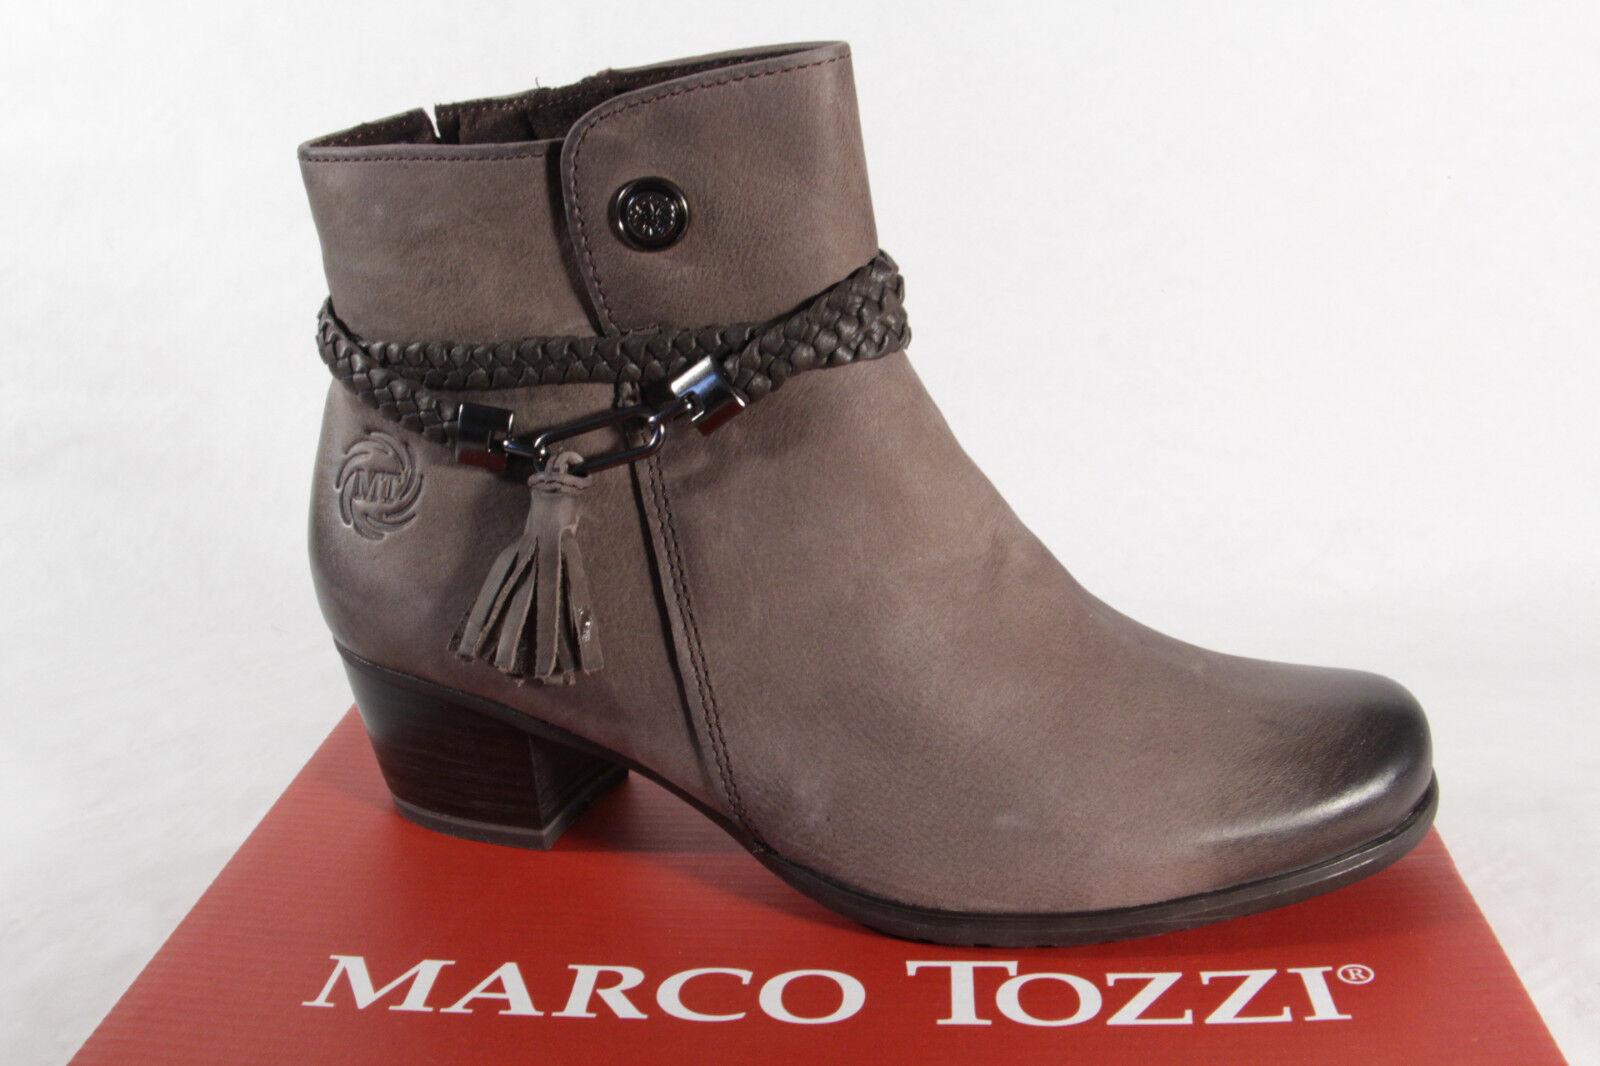 Marco Tozzi 25383 Damen Stiefel, Stiefelette, Stiefel Echtleder grau NEU